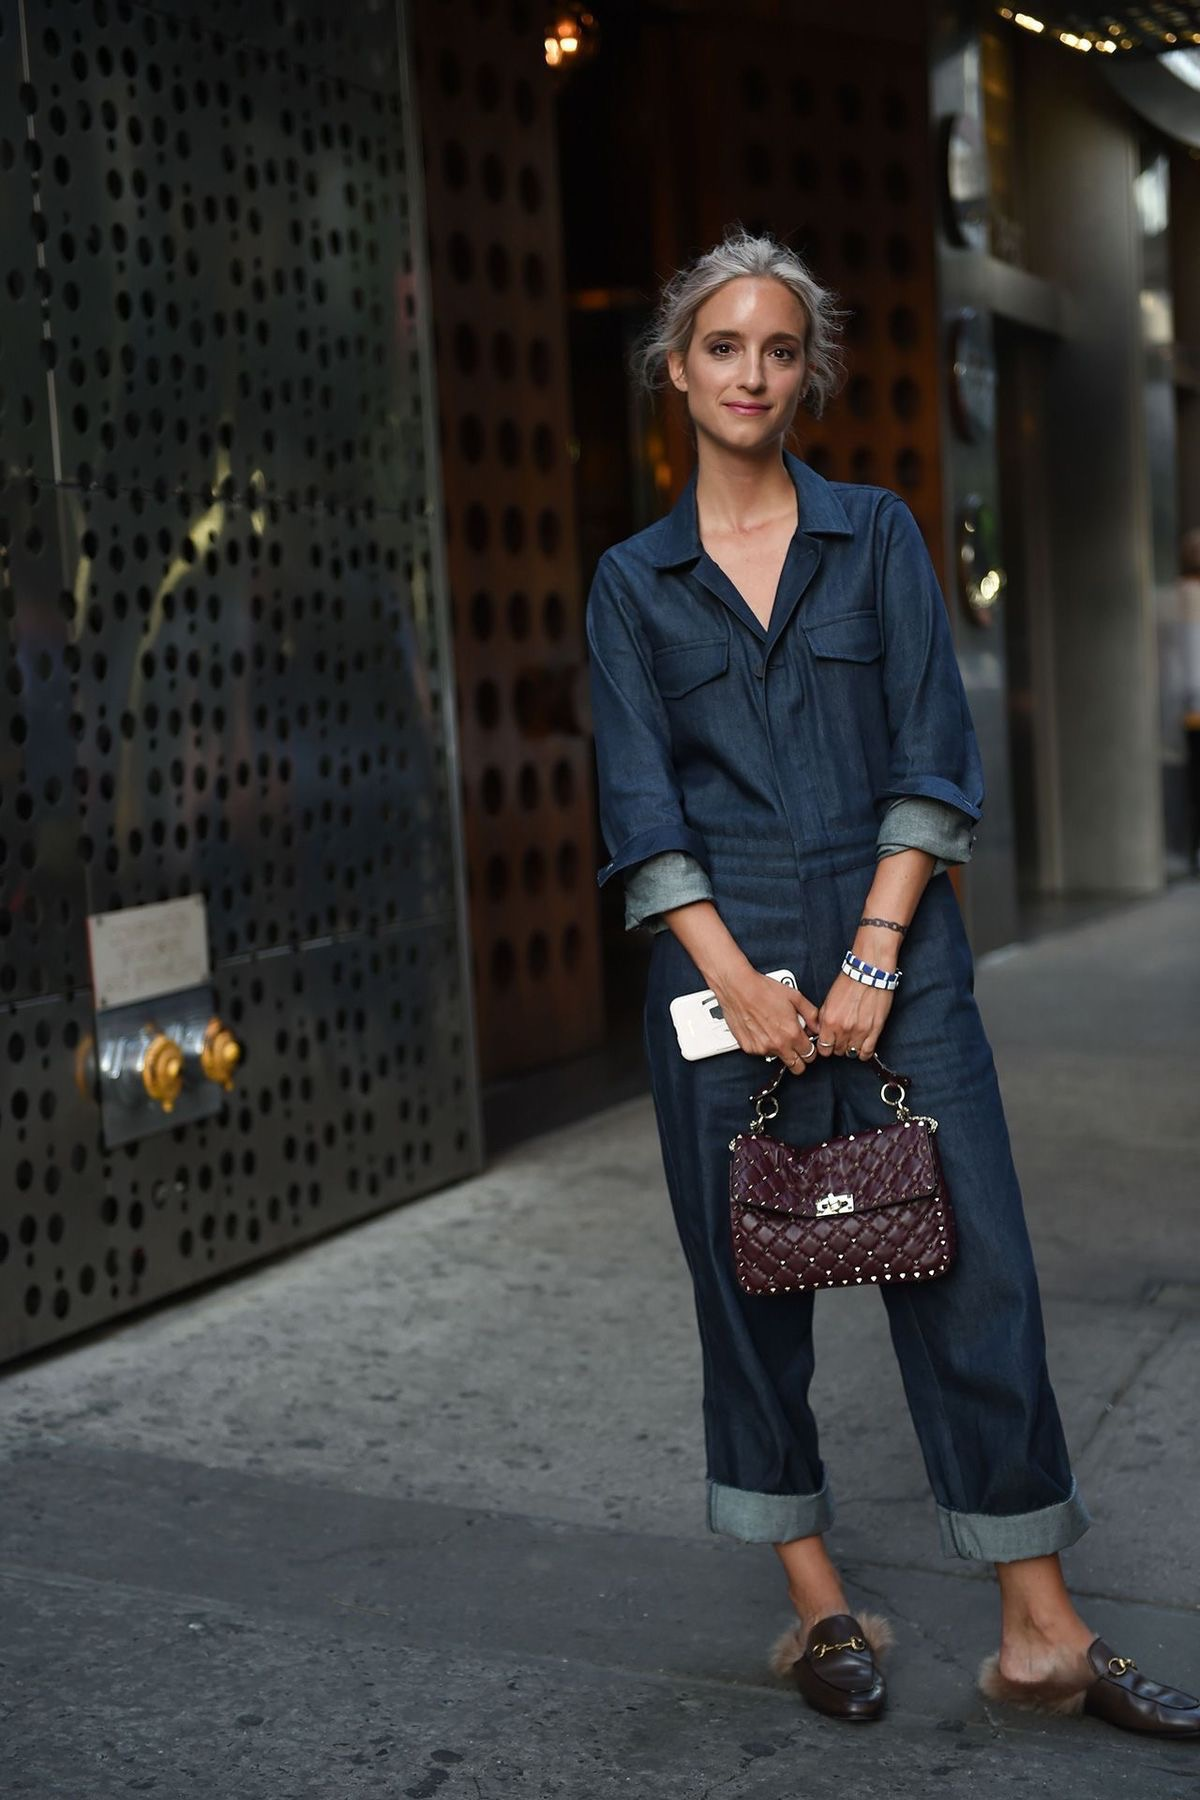 Denim Jumpsuit gucci fur loafers quilted handbag